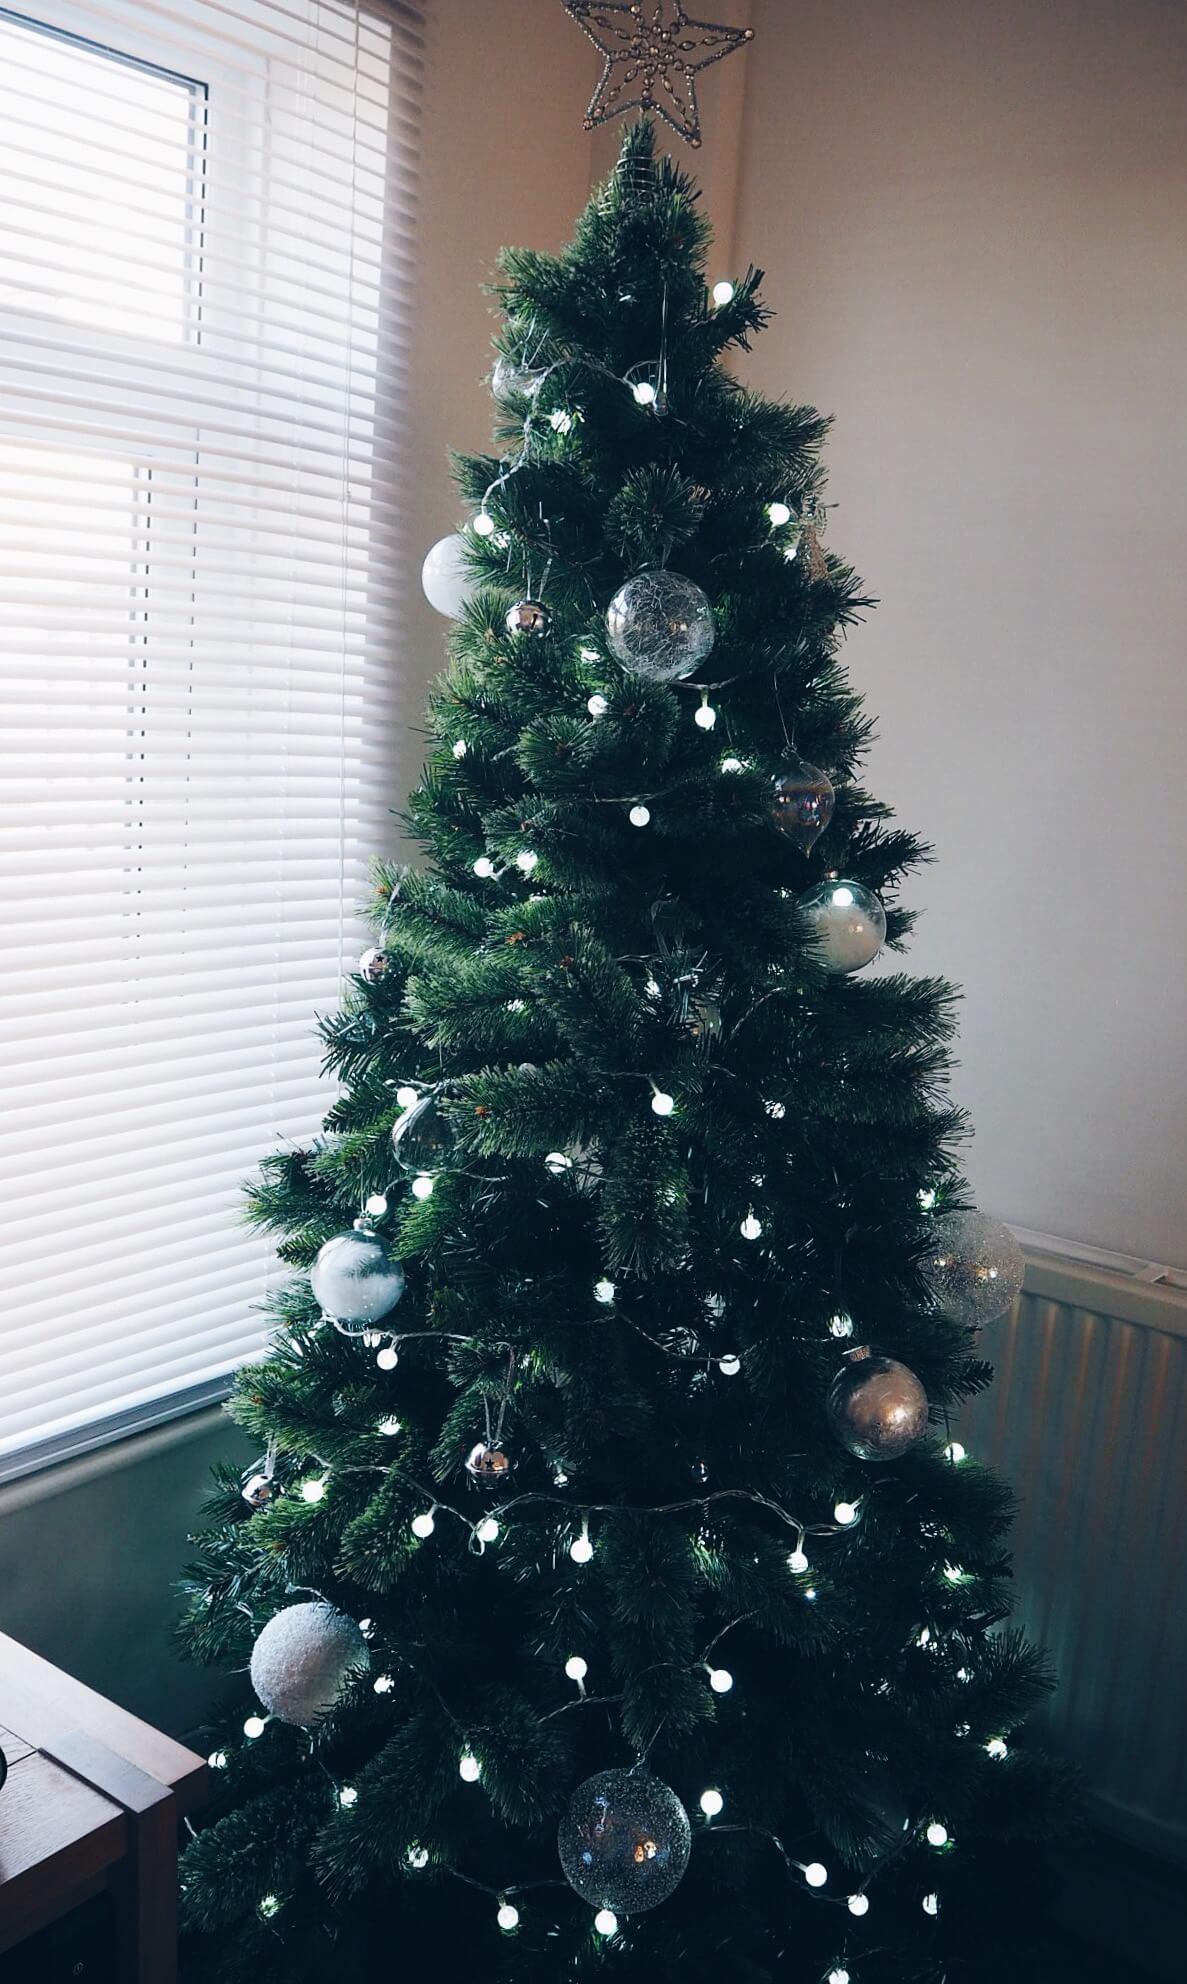 Christmas treeeeeee